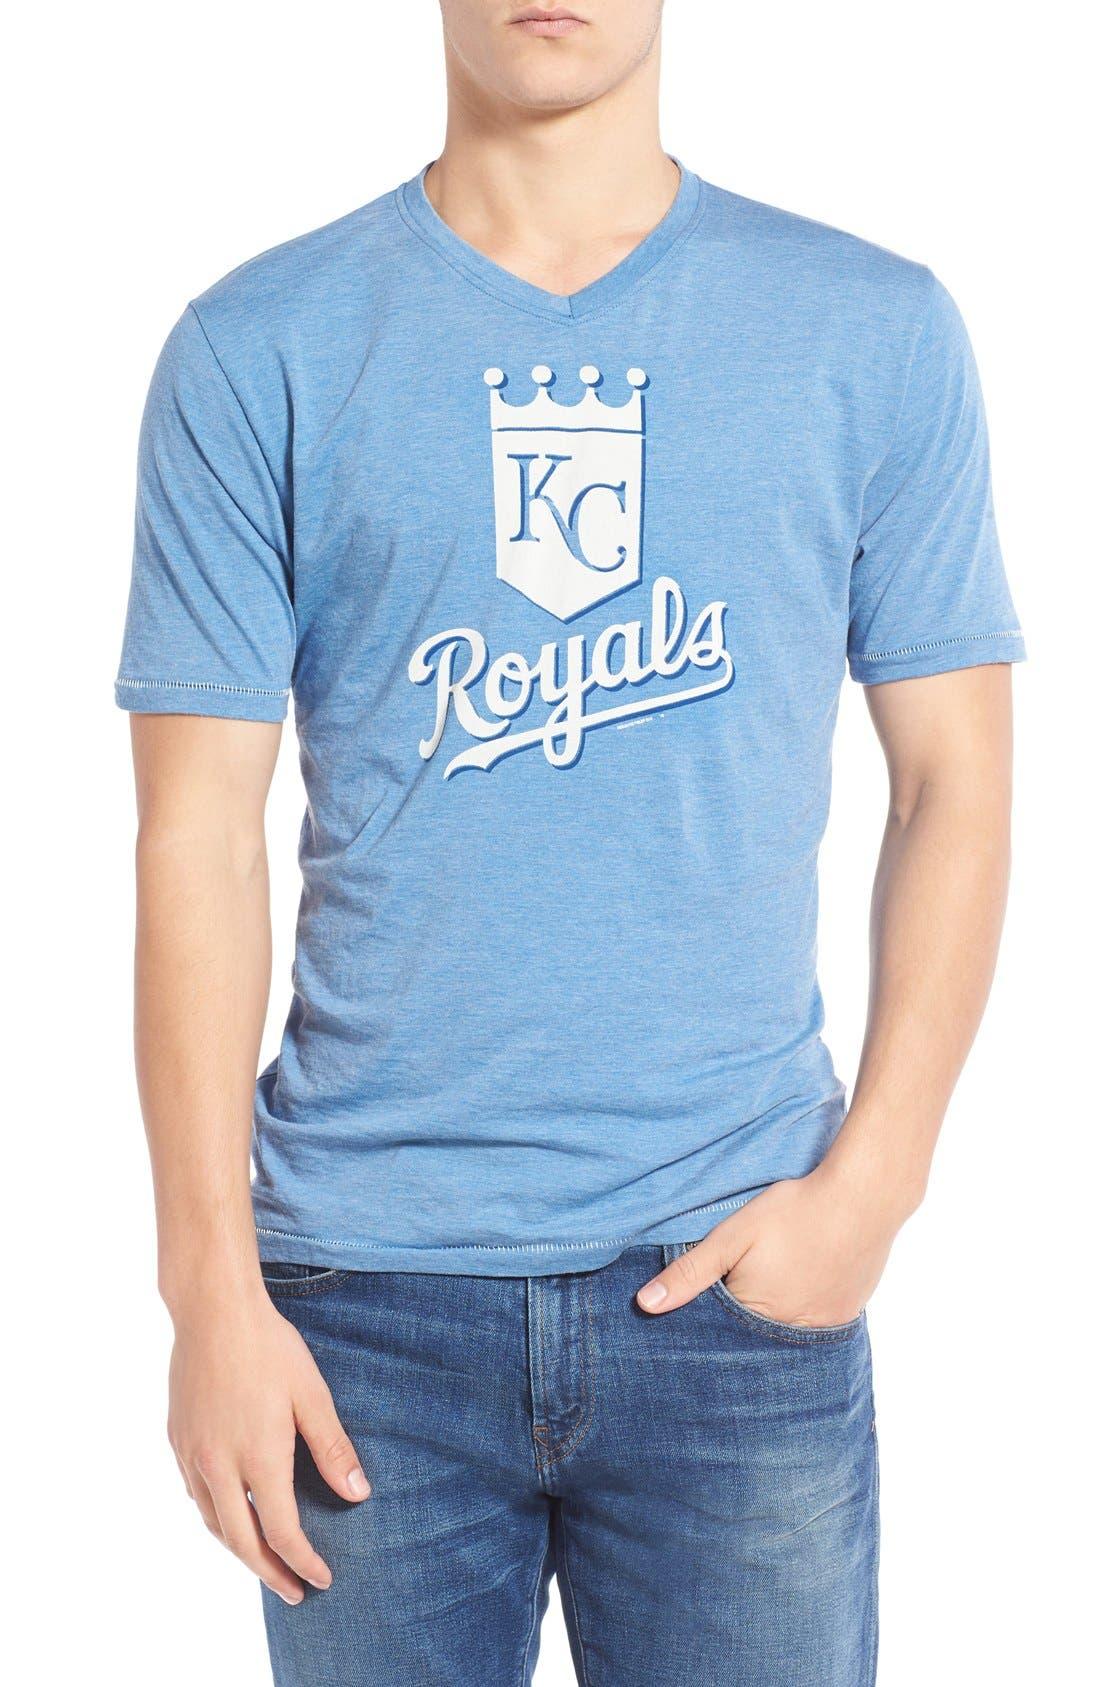 Red Jacket 'Kansas City Royals - Calumet' Graphic V-Neck T-Shirt